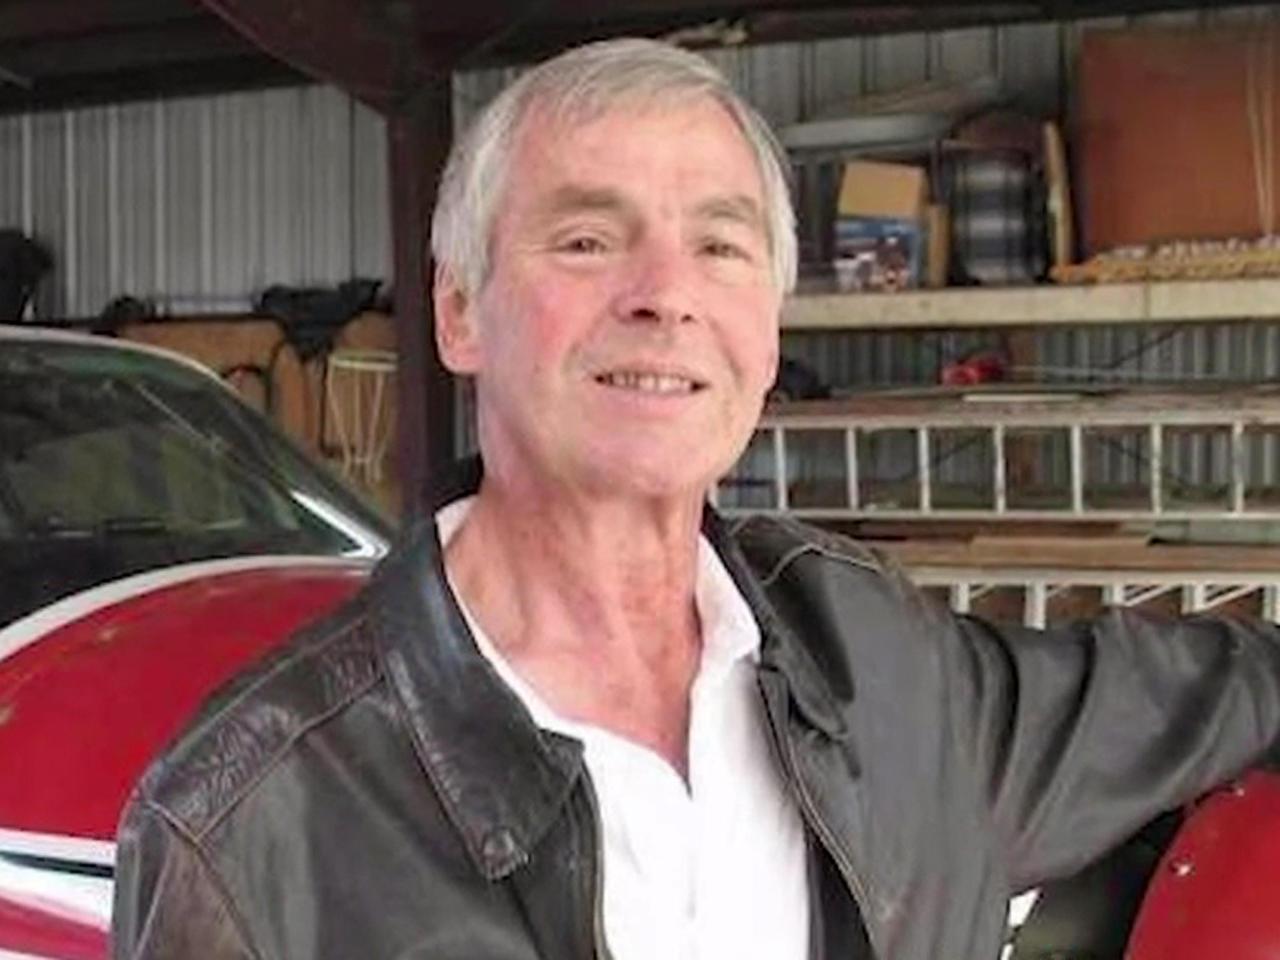 Vietnam War veteran Alfred Pick of Plano, Texas, sentenced